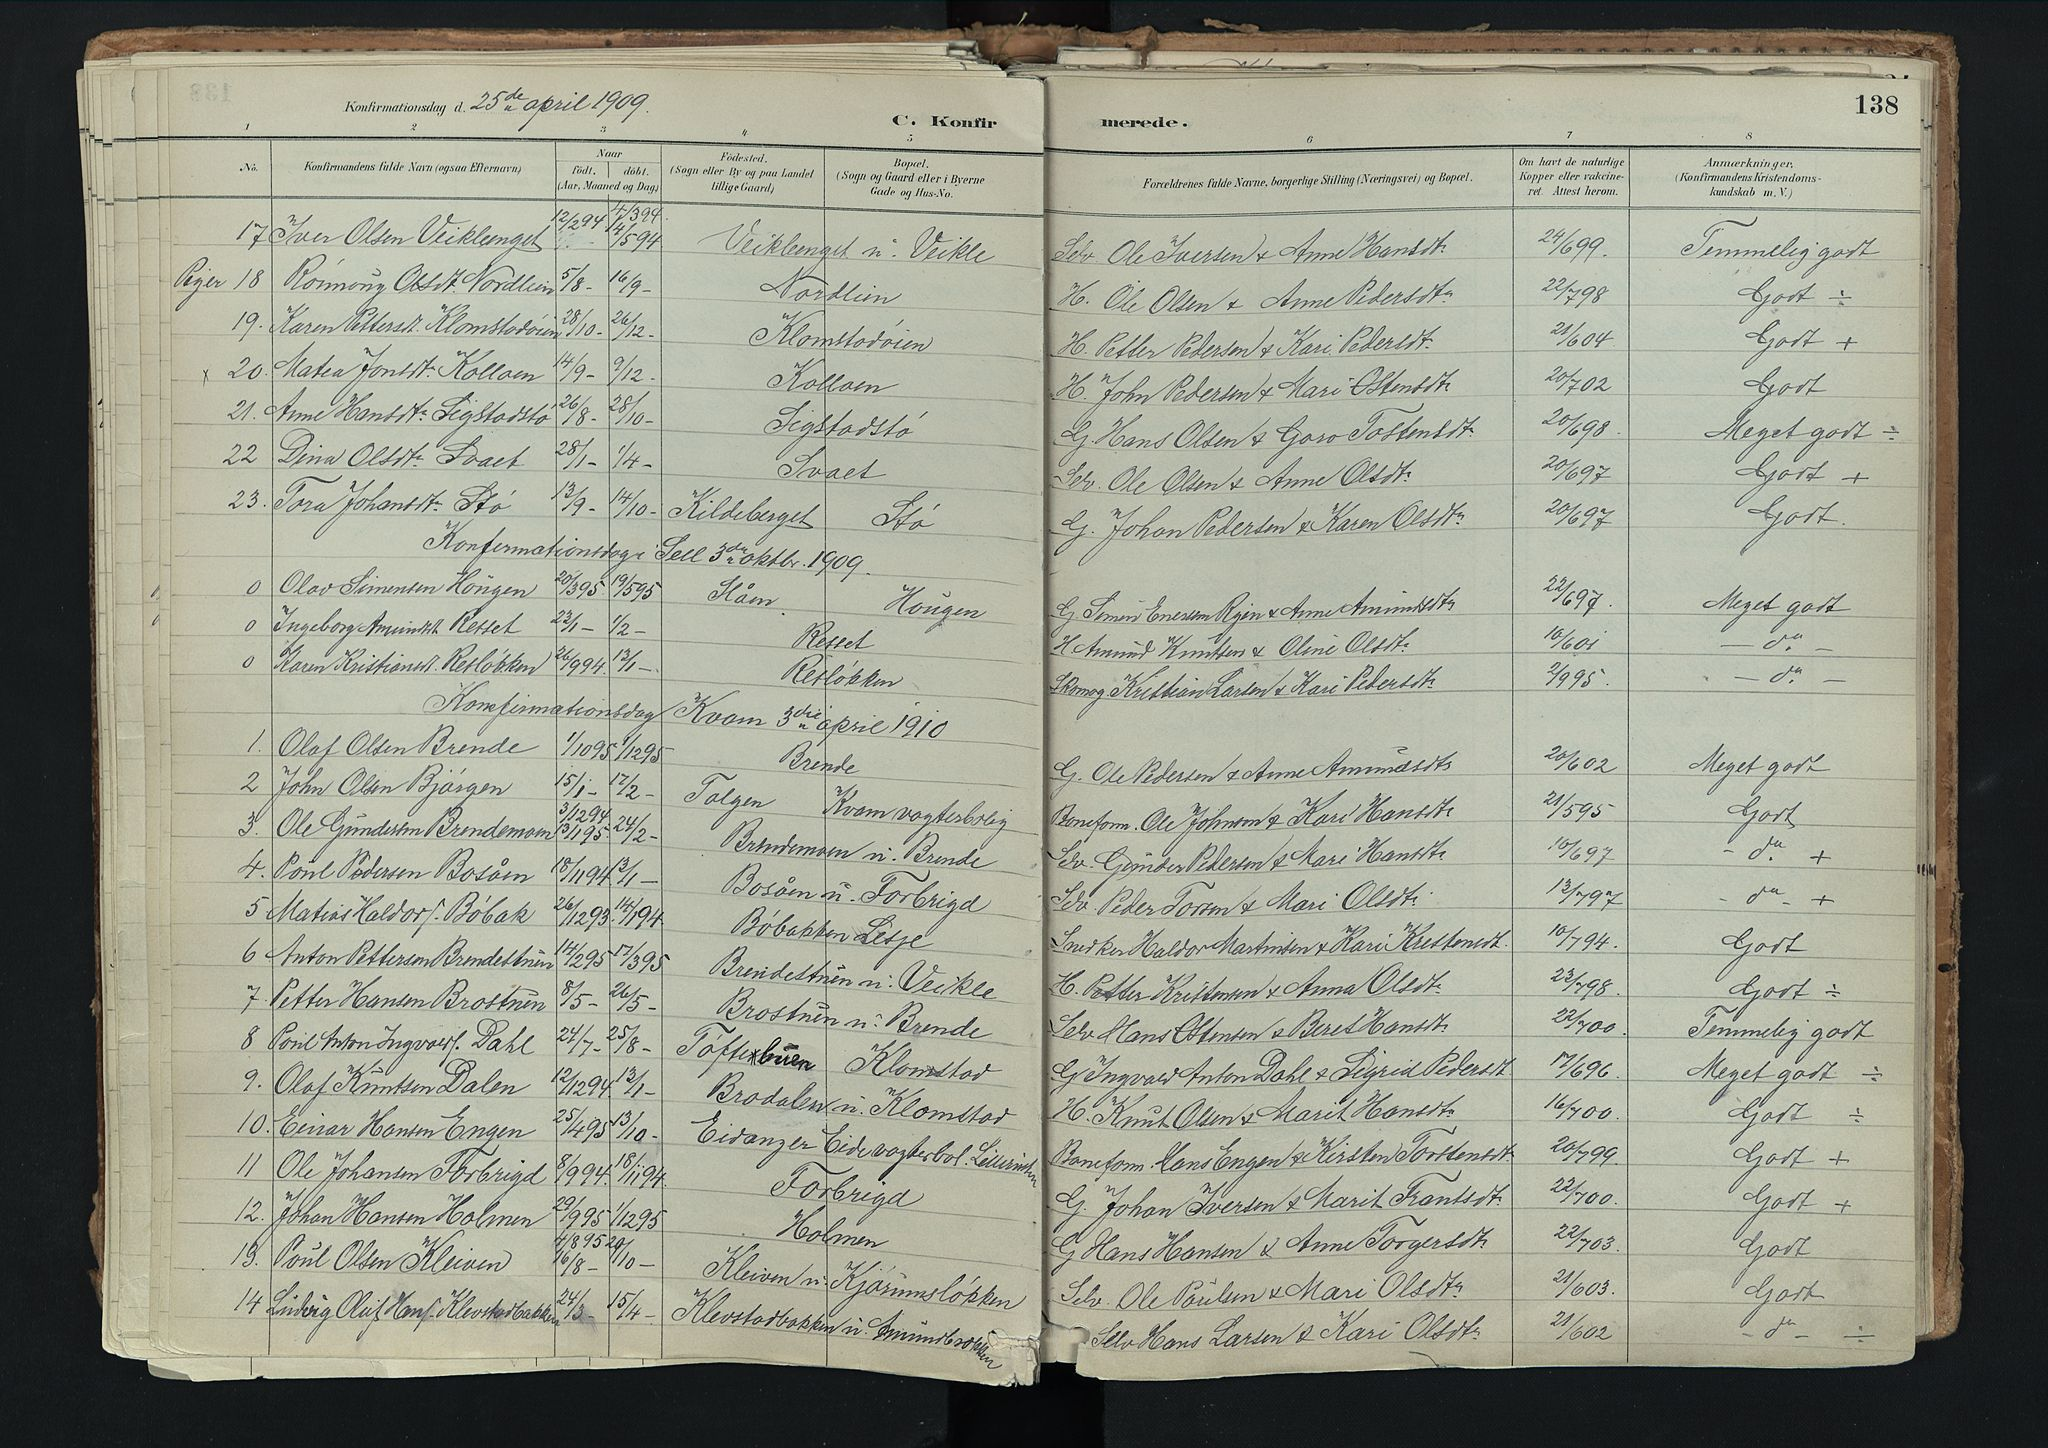 SAH, Nord-Fron prestekontor, Ministerialbok nr. 3, 1884-1914, s. 138